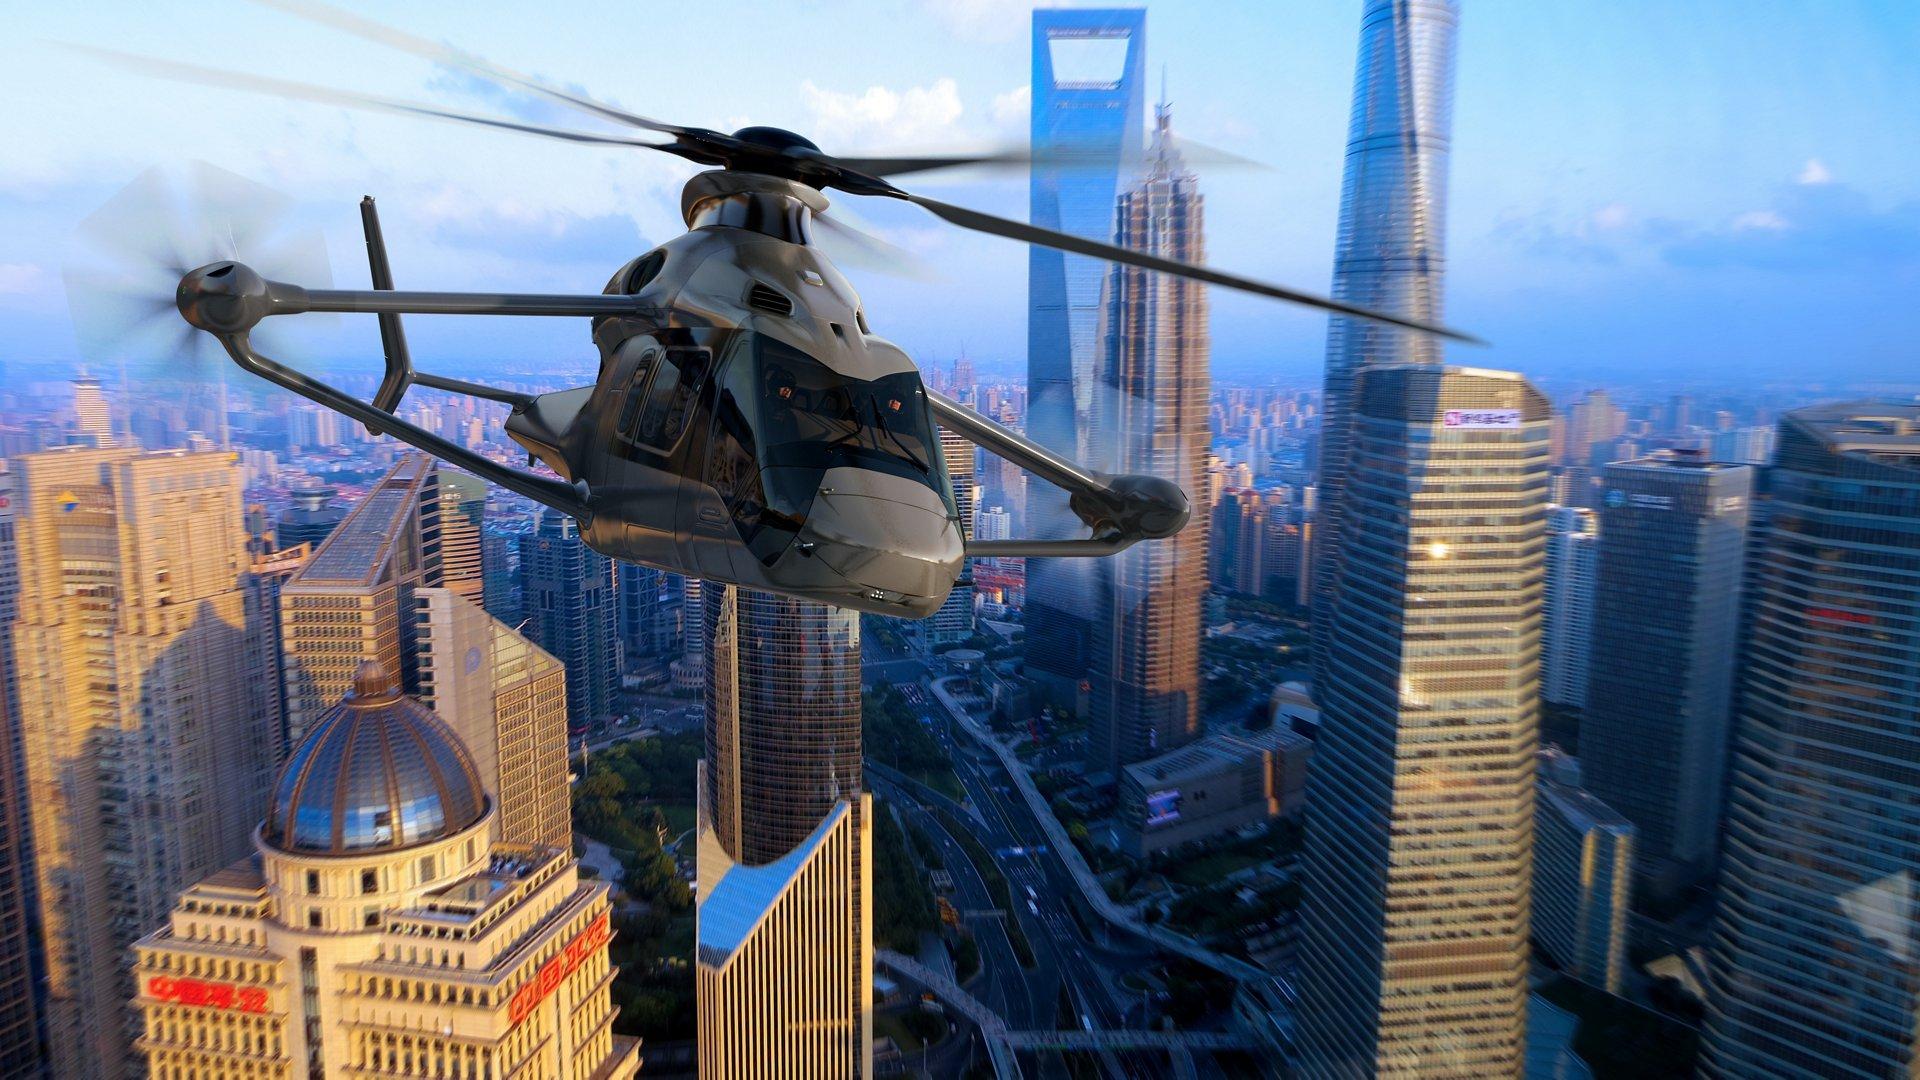 The Racer high-speed VTOL helicopter demonstrator is depicted in flight.